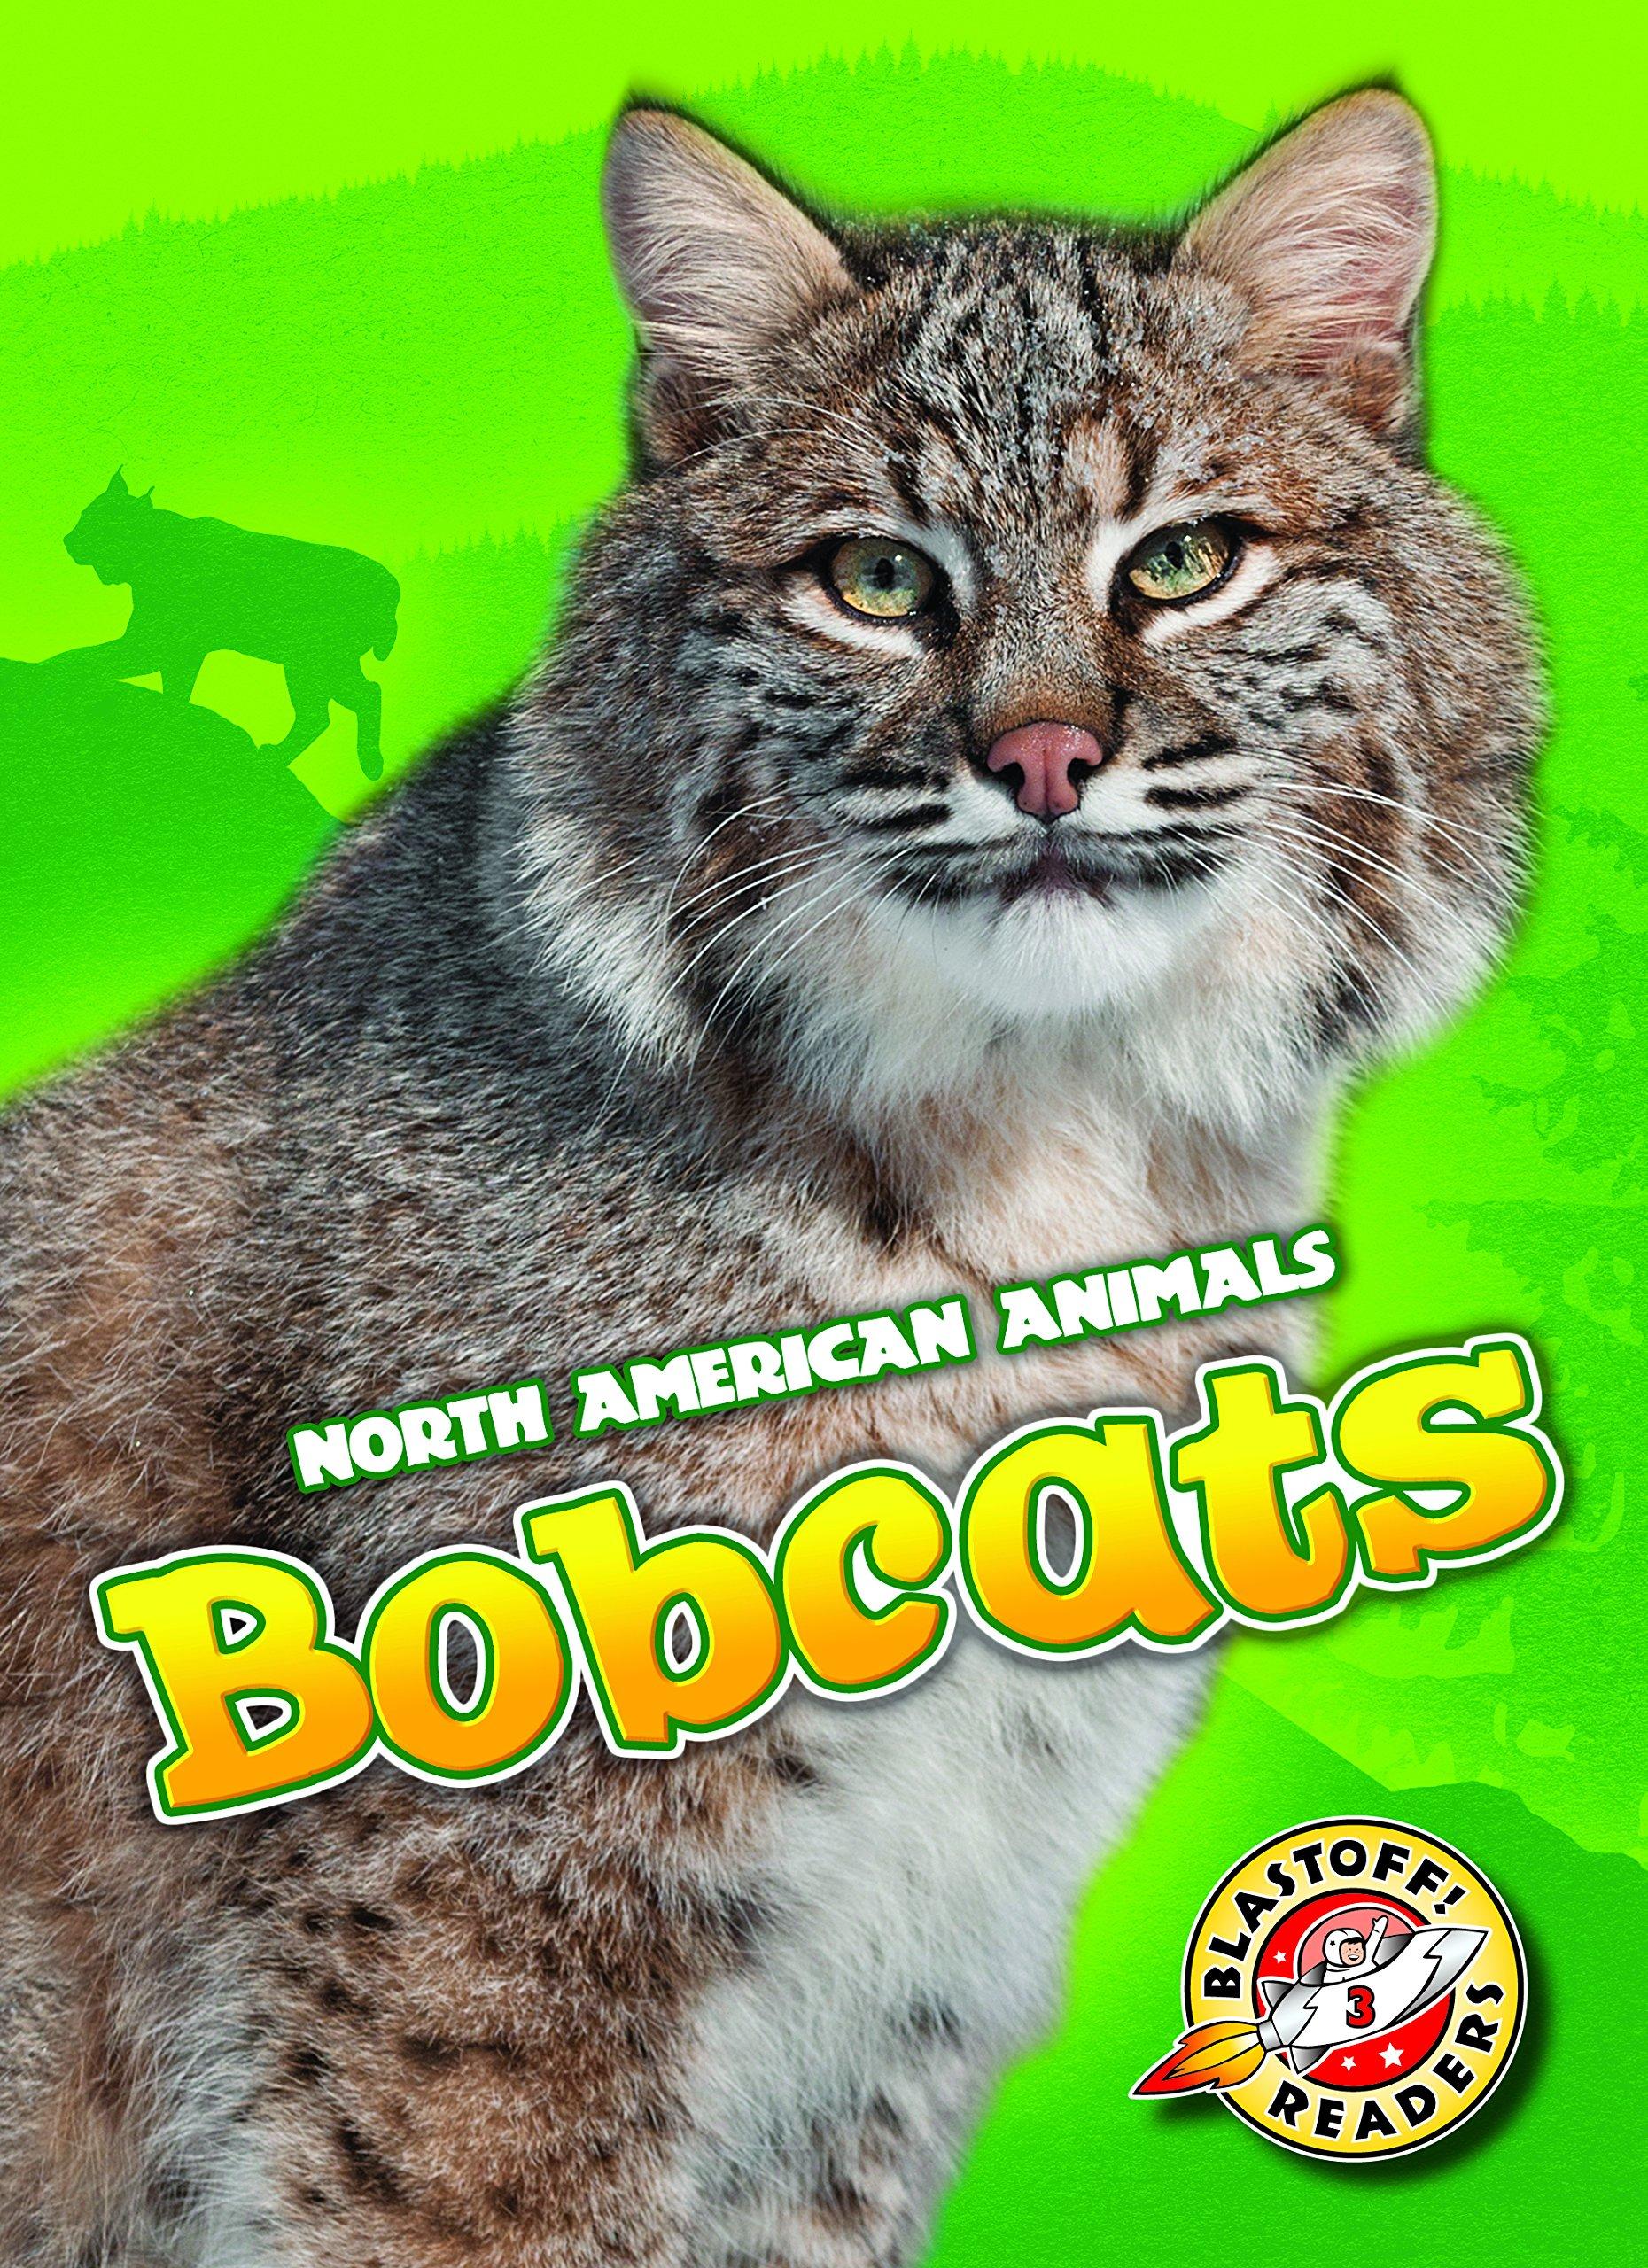 Bobcats (Blastoff! Readers, Level 3: North American Animals) PDF